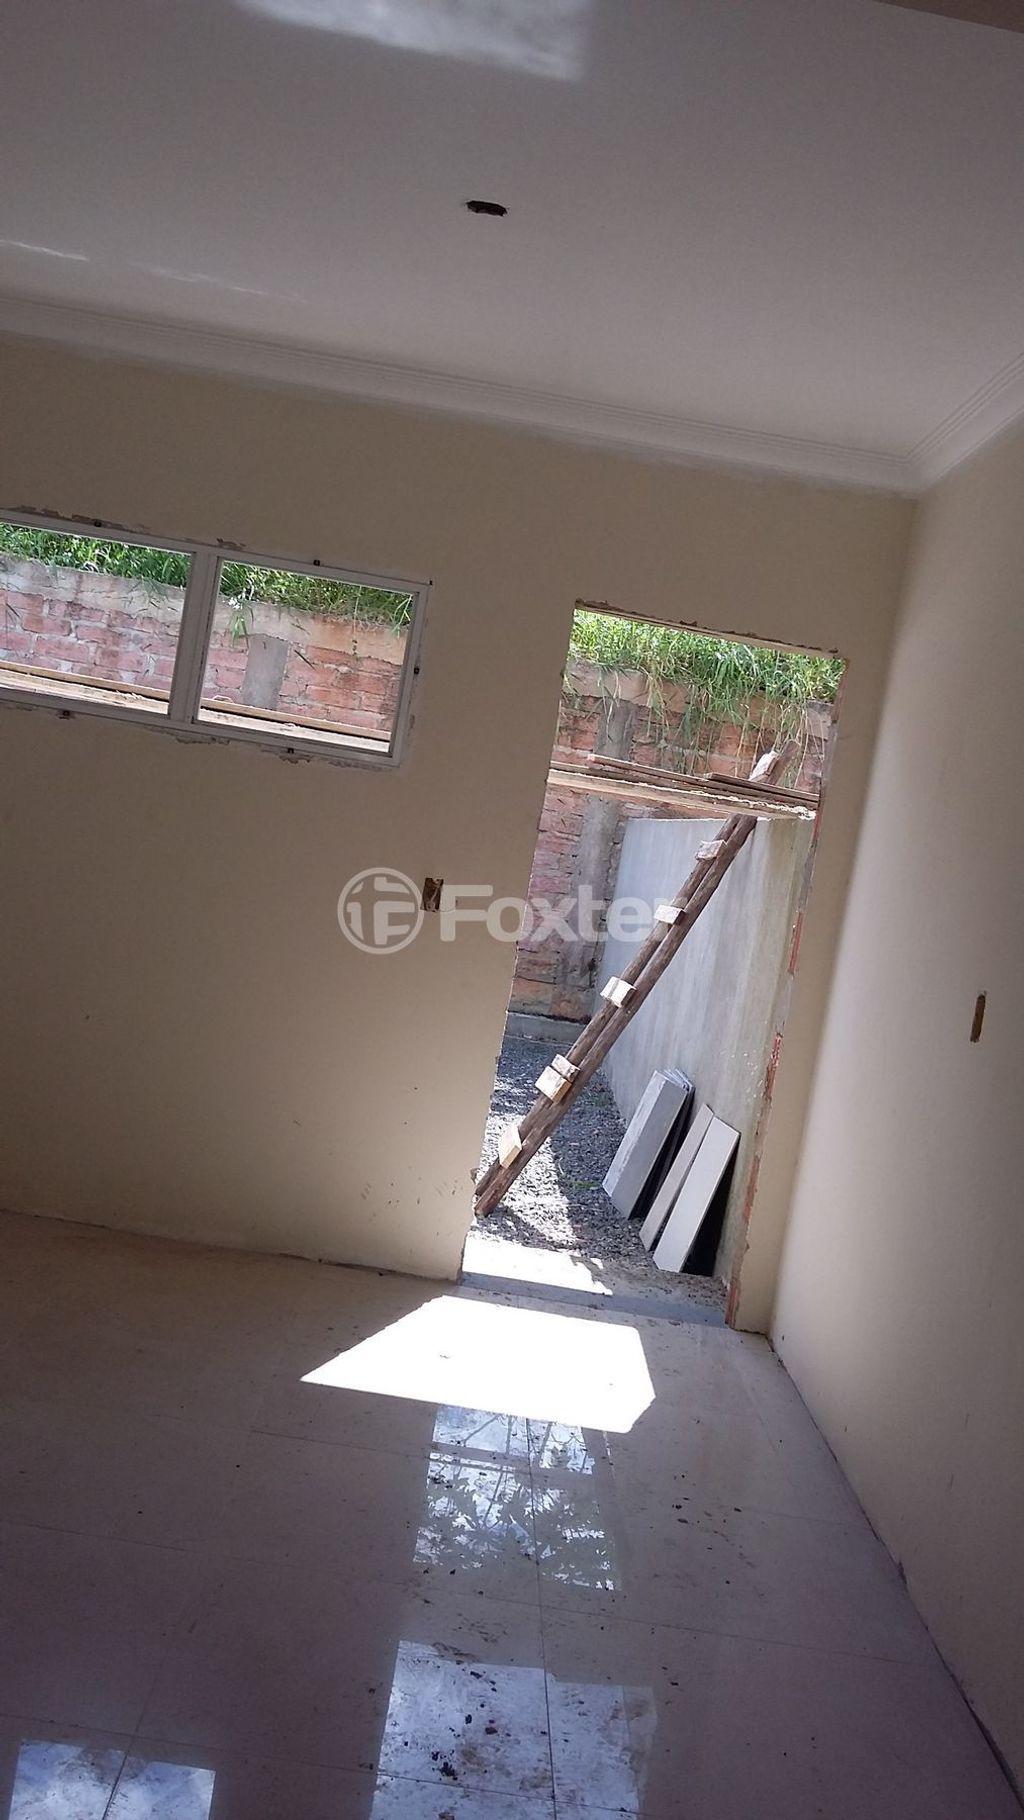 Casa 2 Dorm, Protásio Alves, Porto Alegre (136774) - Foto 9